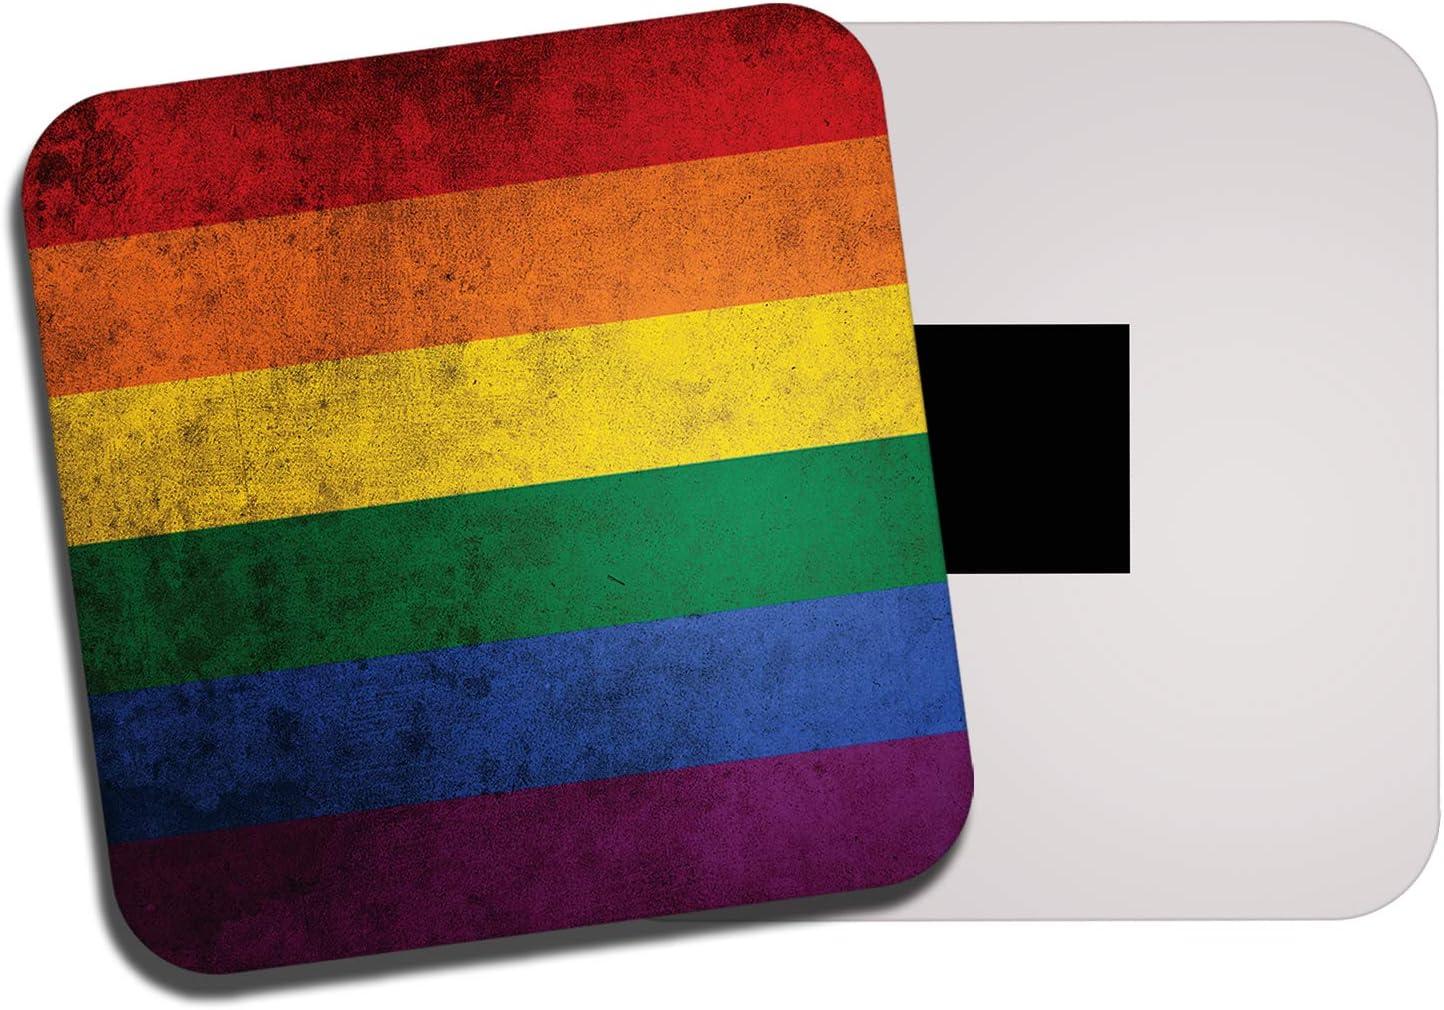 DestinationVinyl Gay Pride Flag Fridge Magnet - Lesbian LGBT Bisexual Rainbow Trans Gift #8841